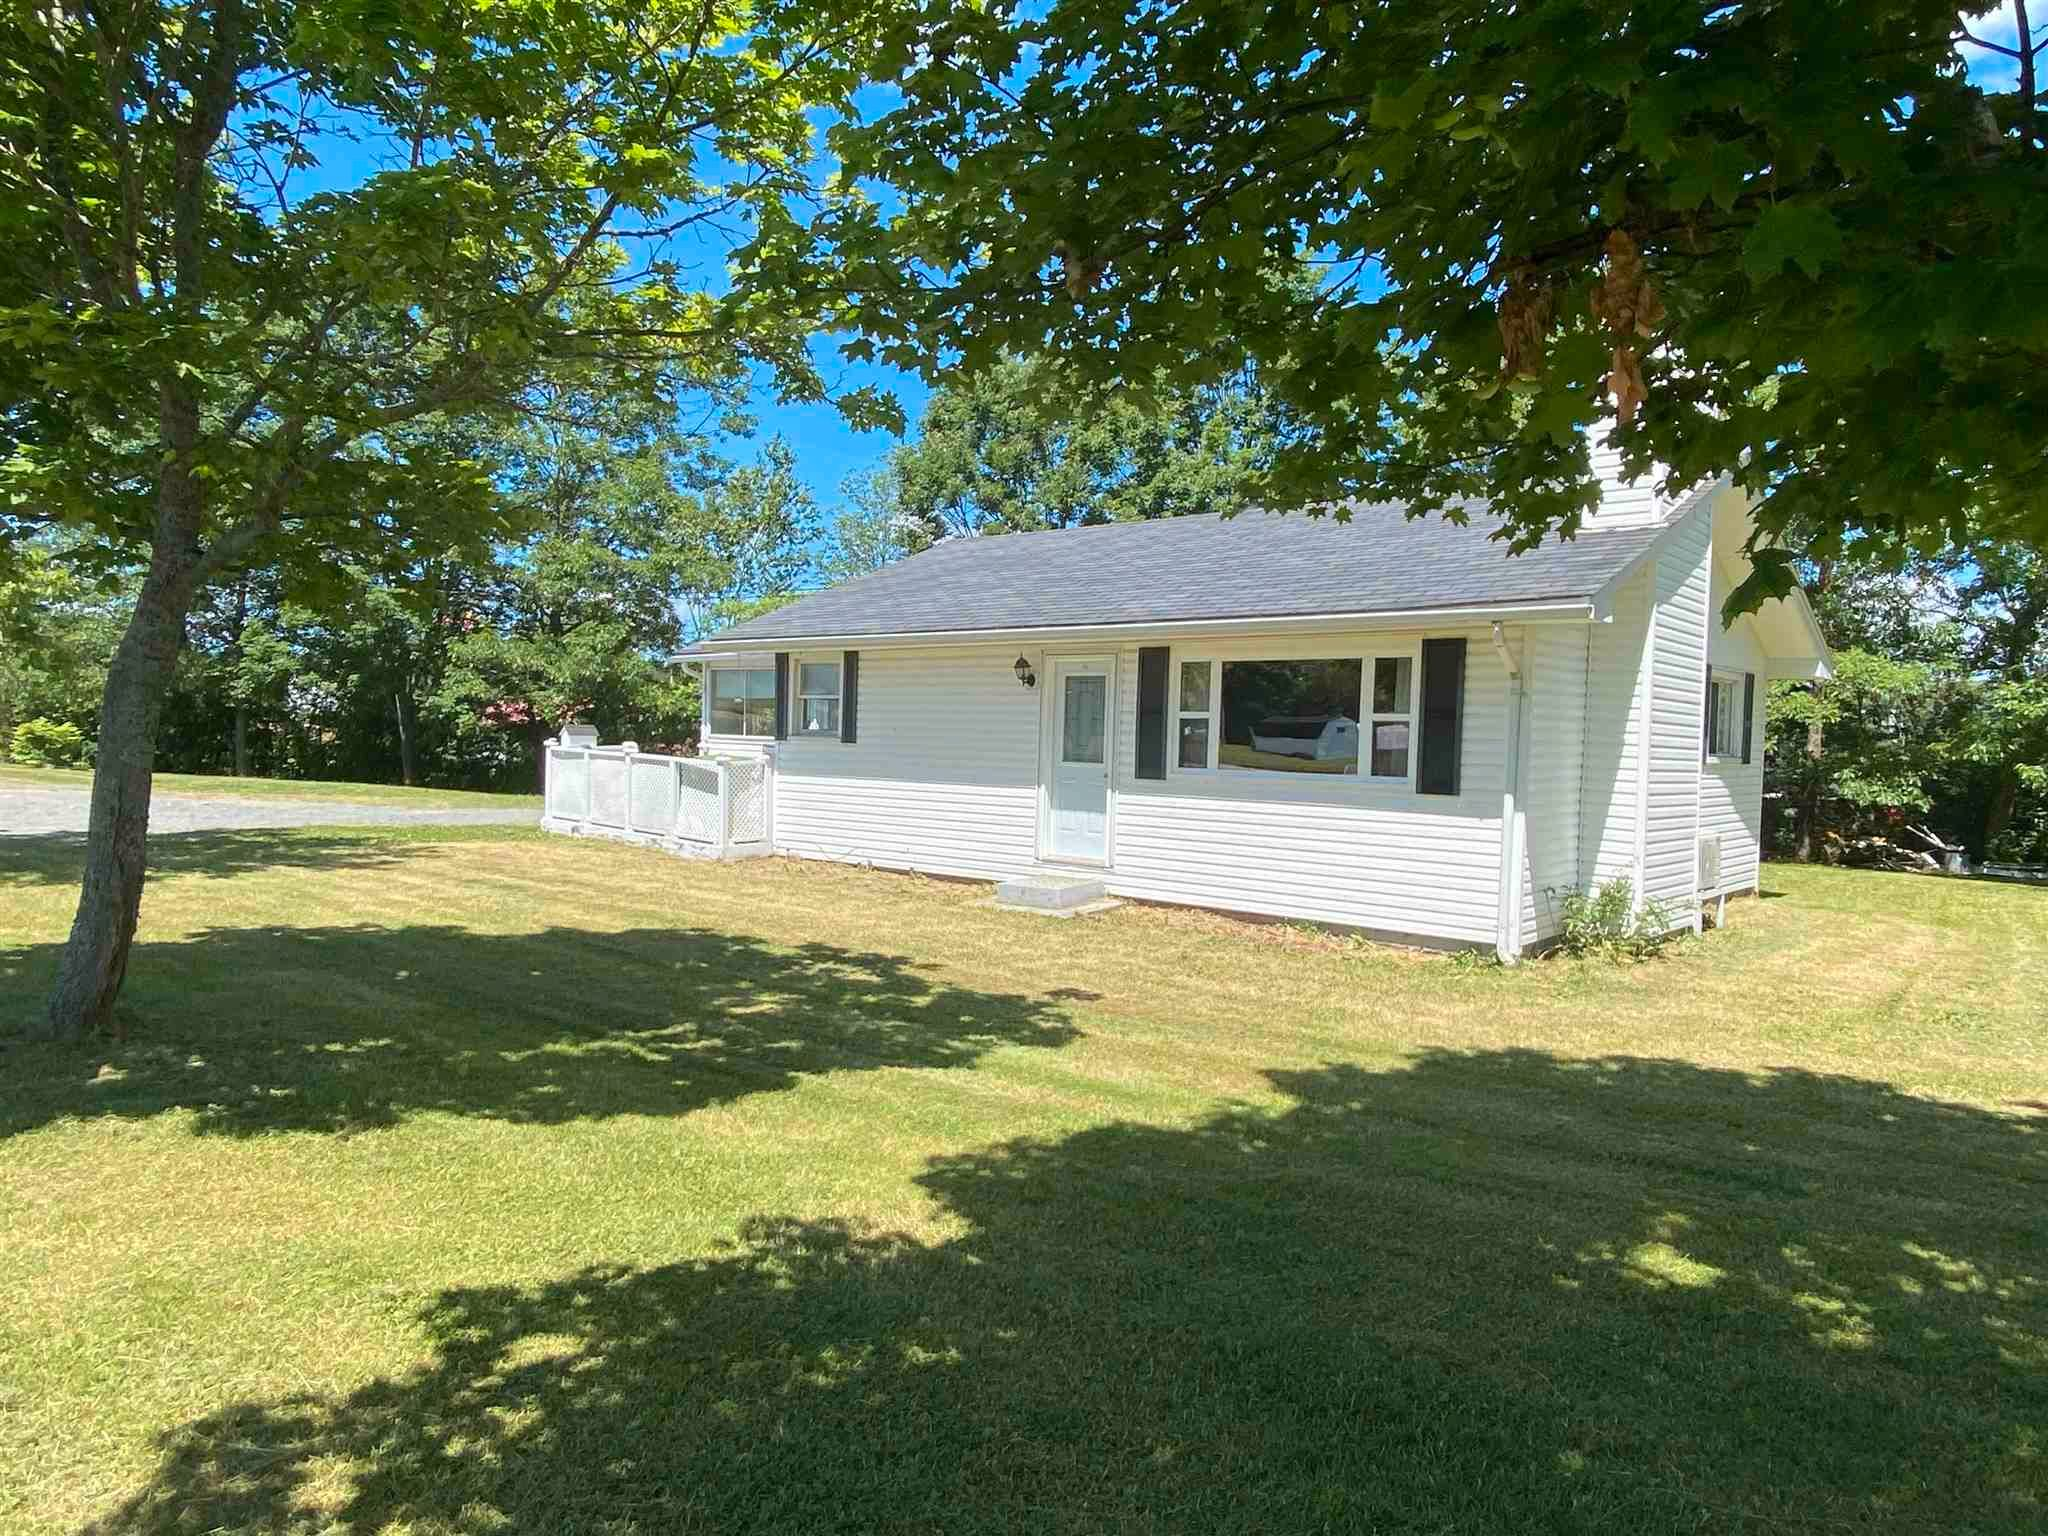 Main Photo: 157 Church Street in Antigonish: 301-Antigonish Residential for sale (Highland Region)  : MLS®# 202117662